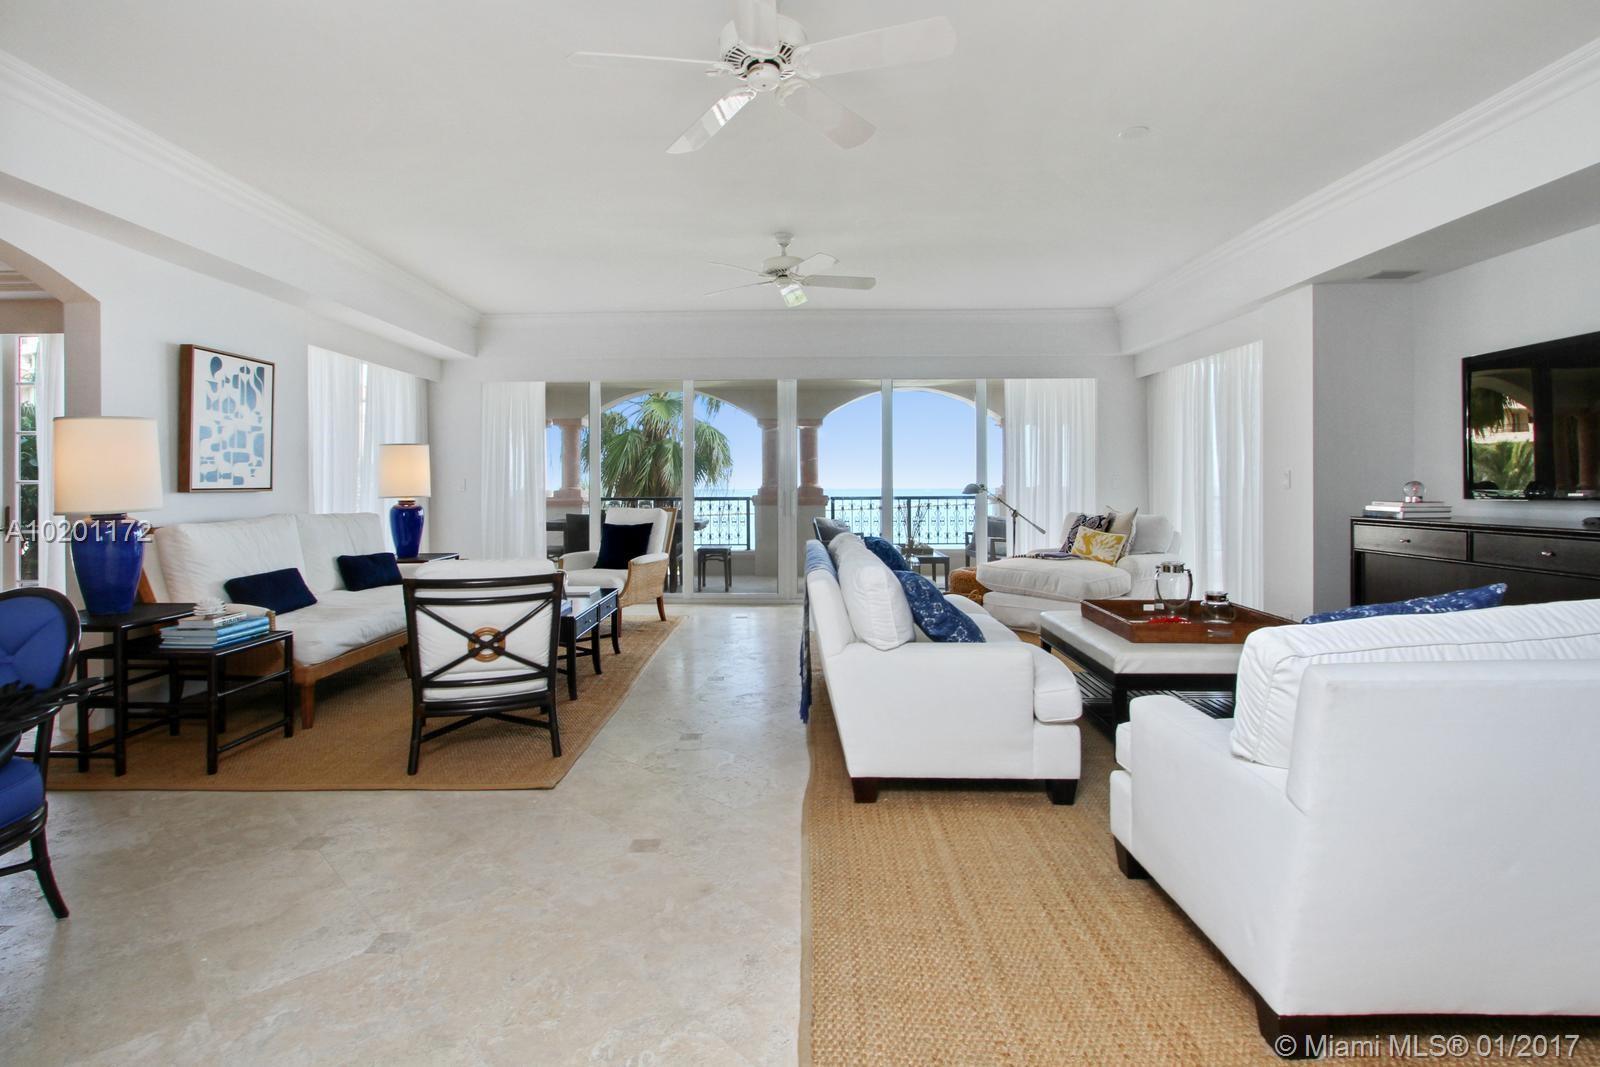 7742 Fisher island dr-7742 miami-beach--fl-33109-a10201172-Pic24